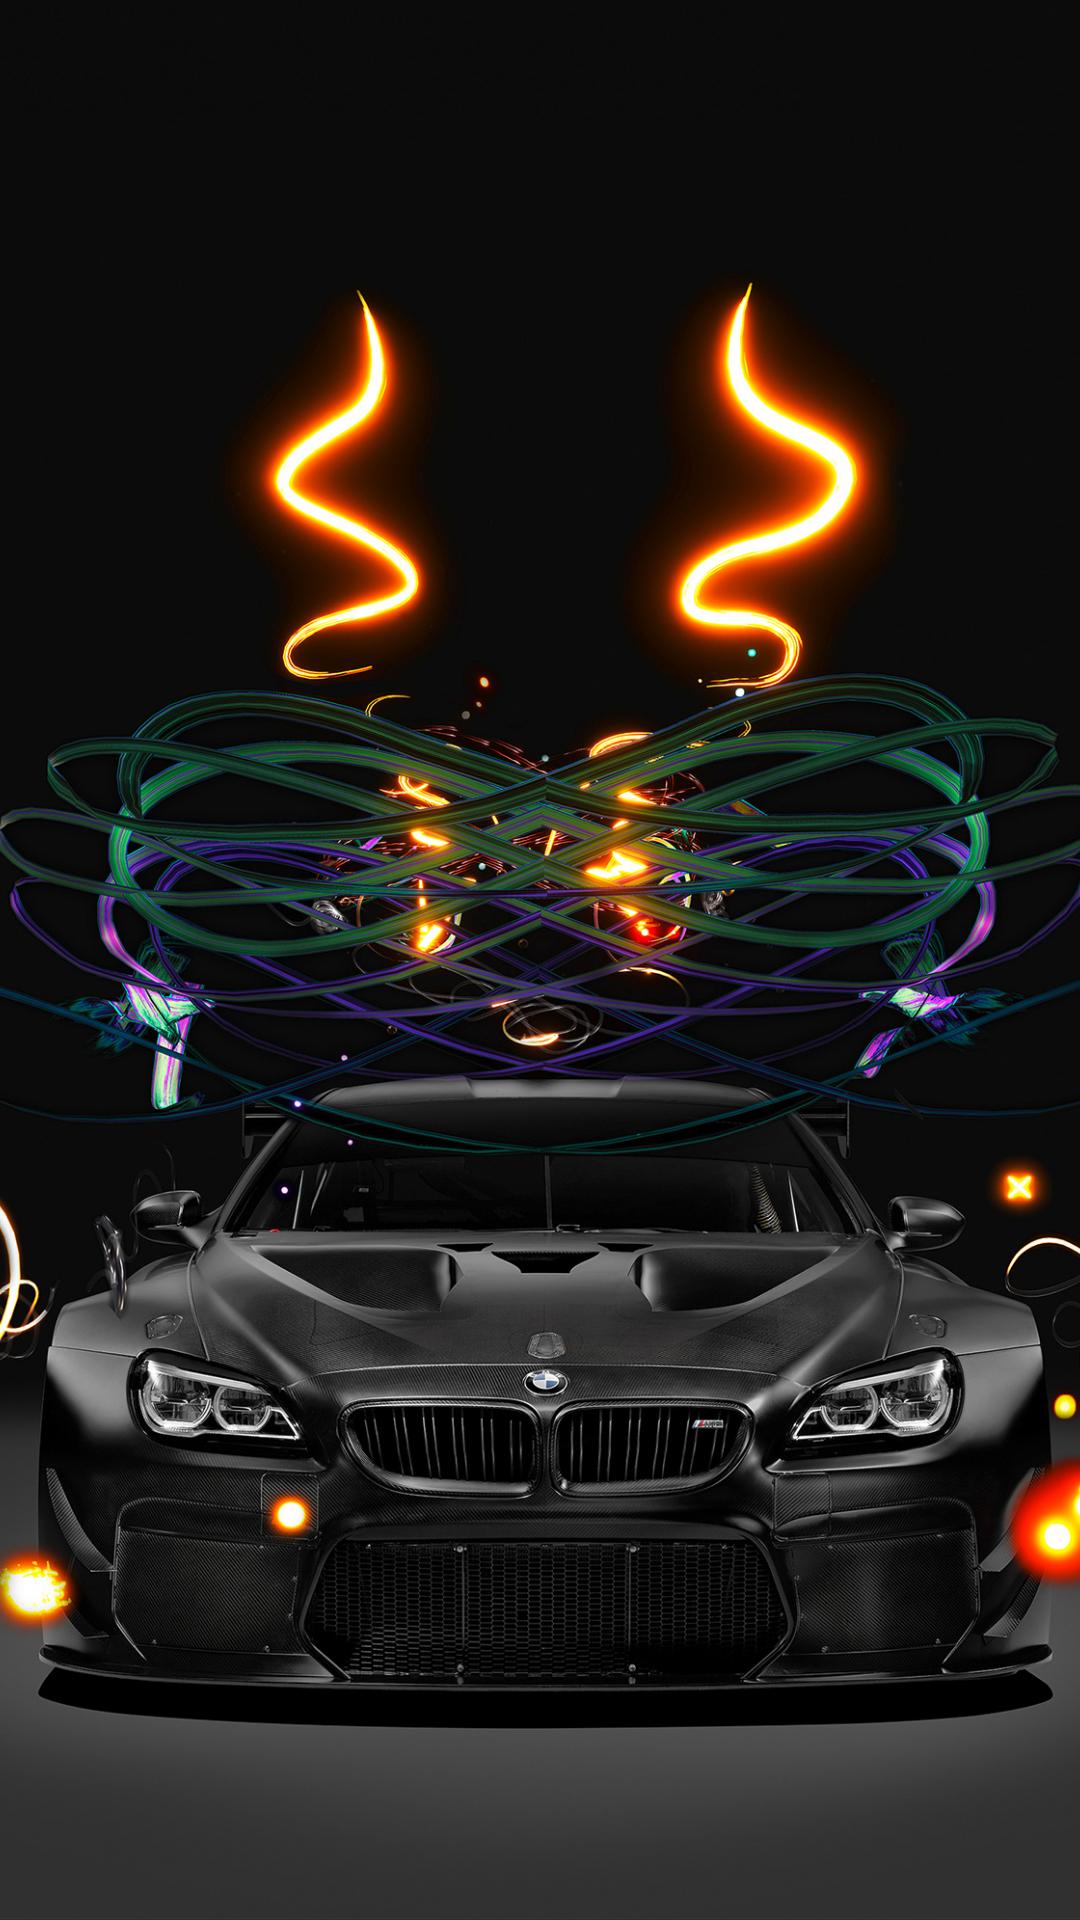 Download 1080x1920 Wallpaper Bmw M6 Gt3 Bmw Art Car 4k Samsung